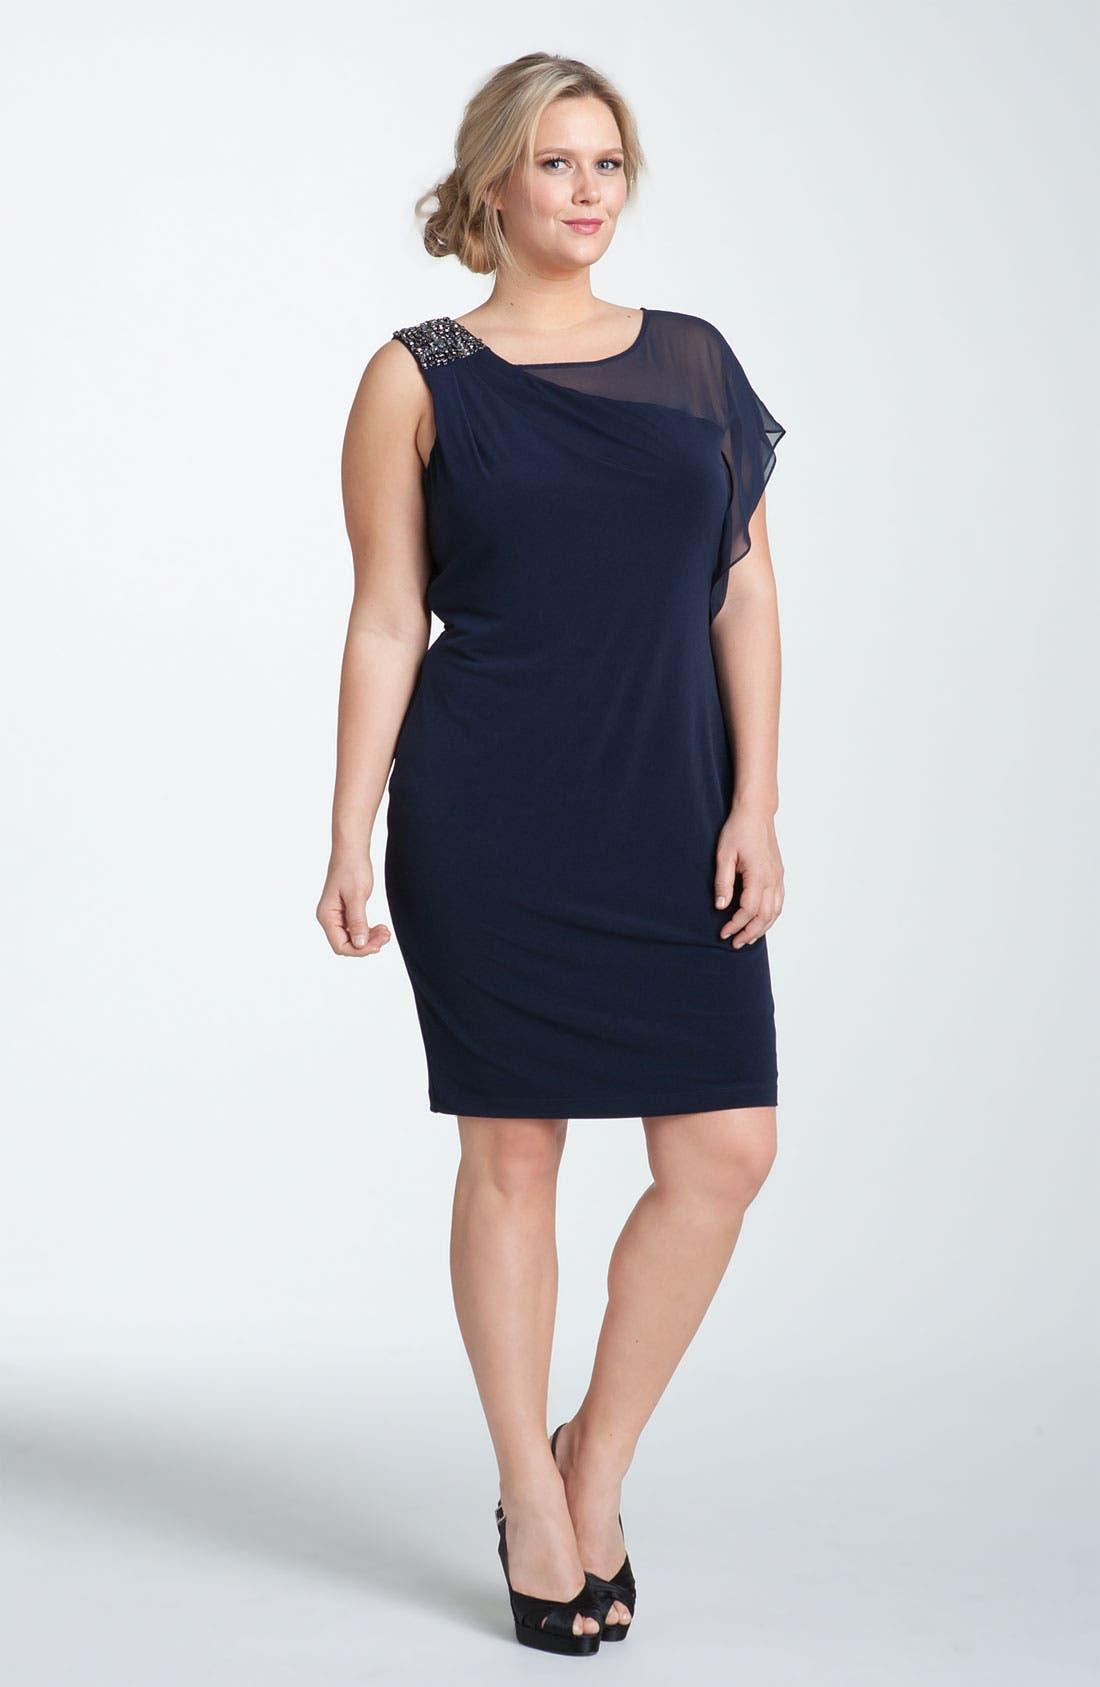 Alternate Image 1 Selected - Calvin Klein Embellished Matte Jersey & Chiffon Dress (Plus Size)